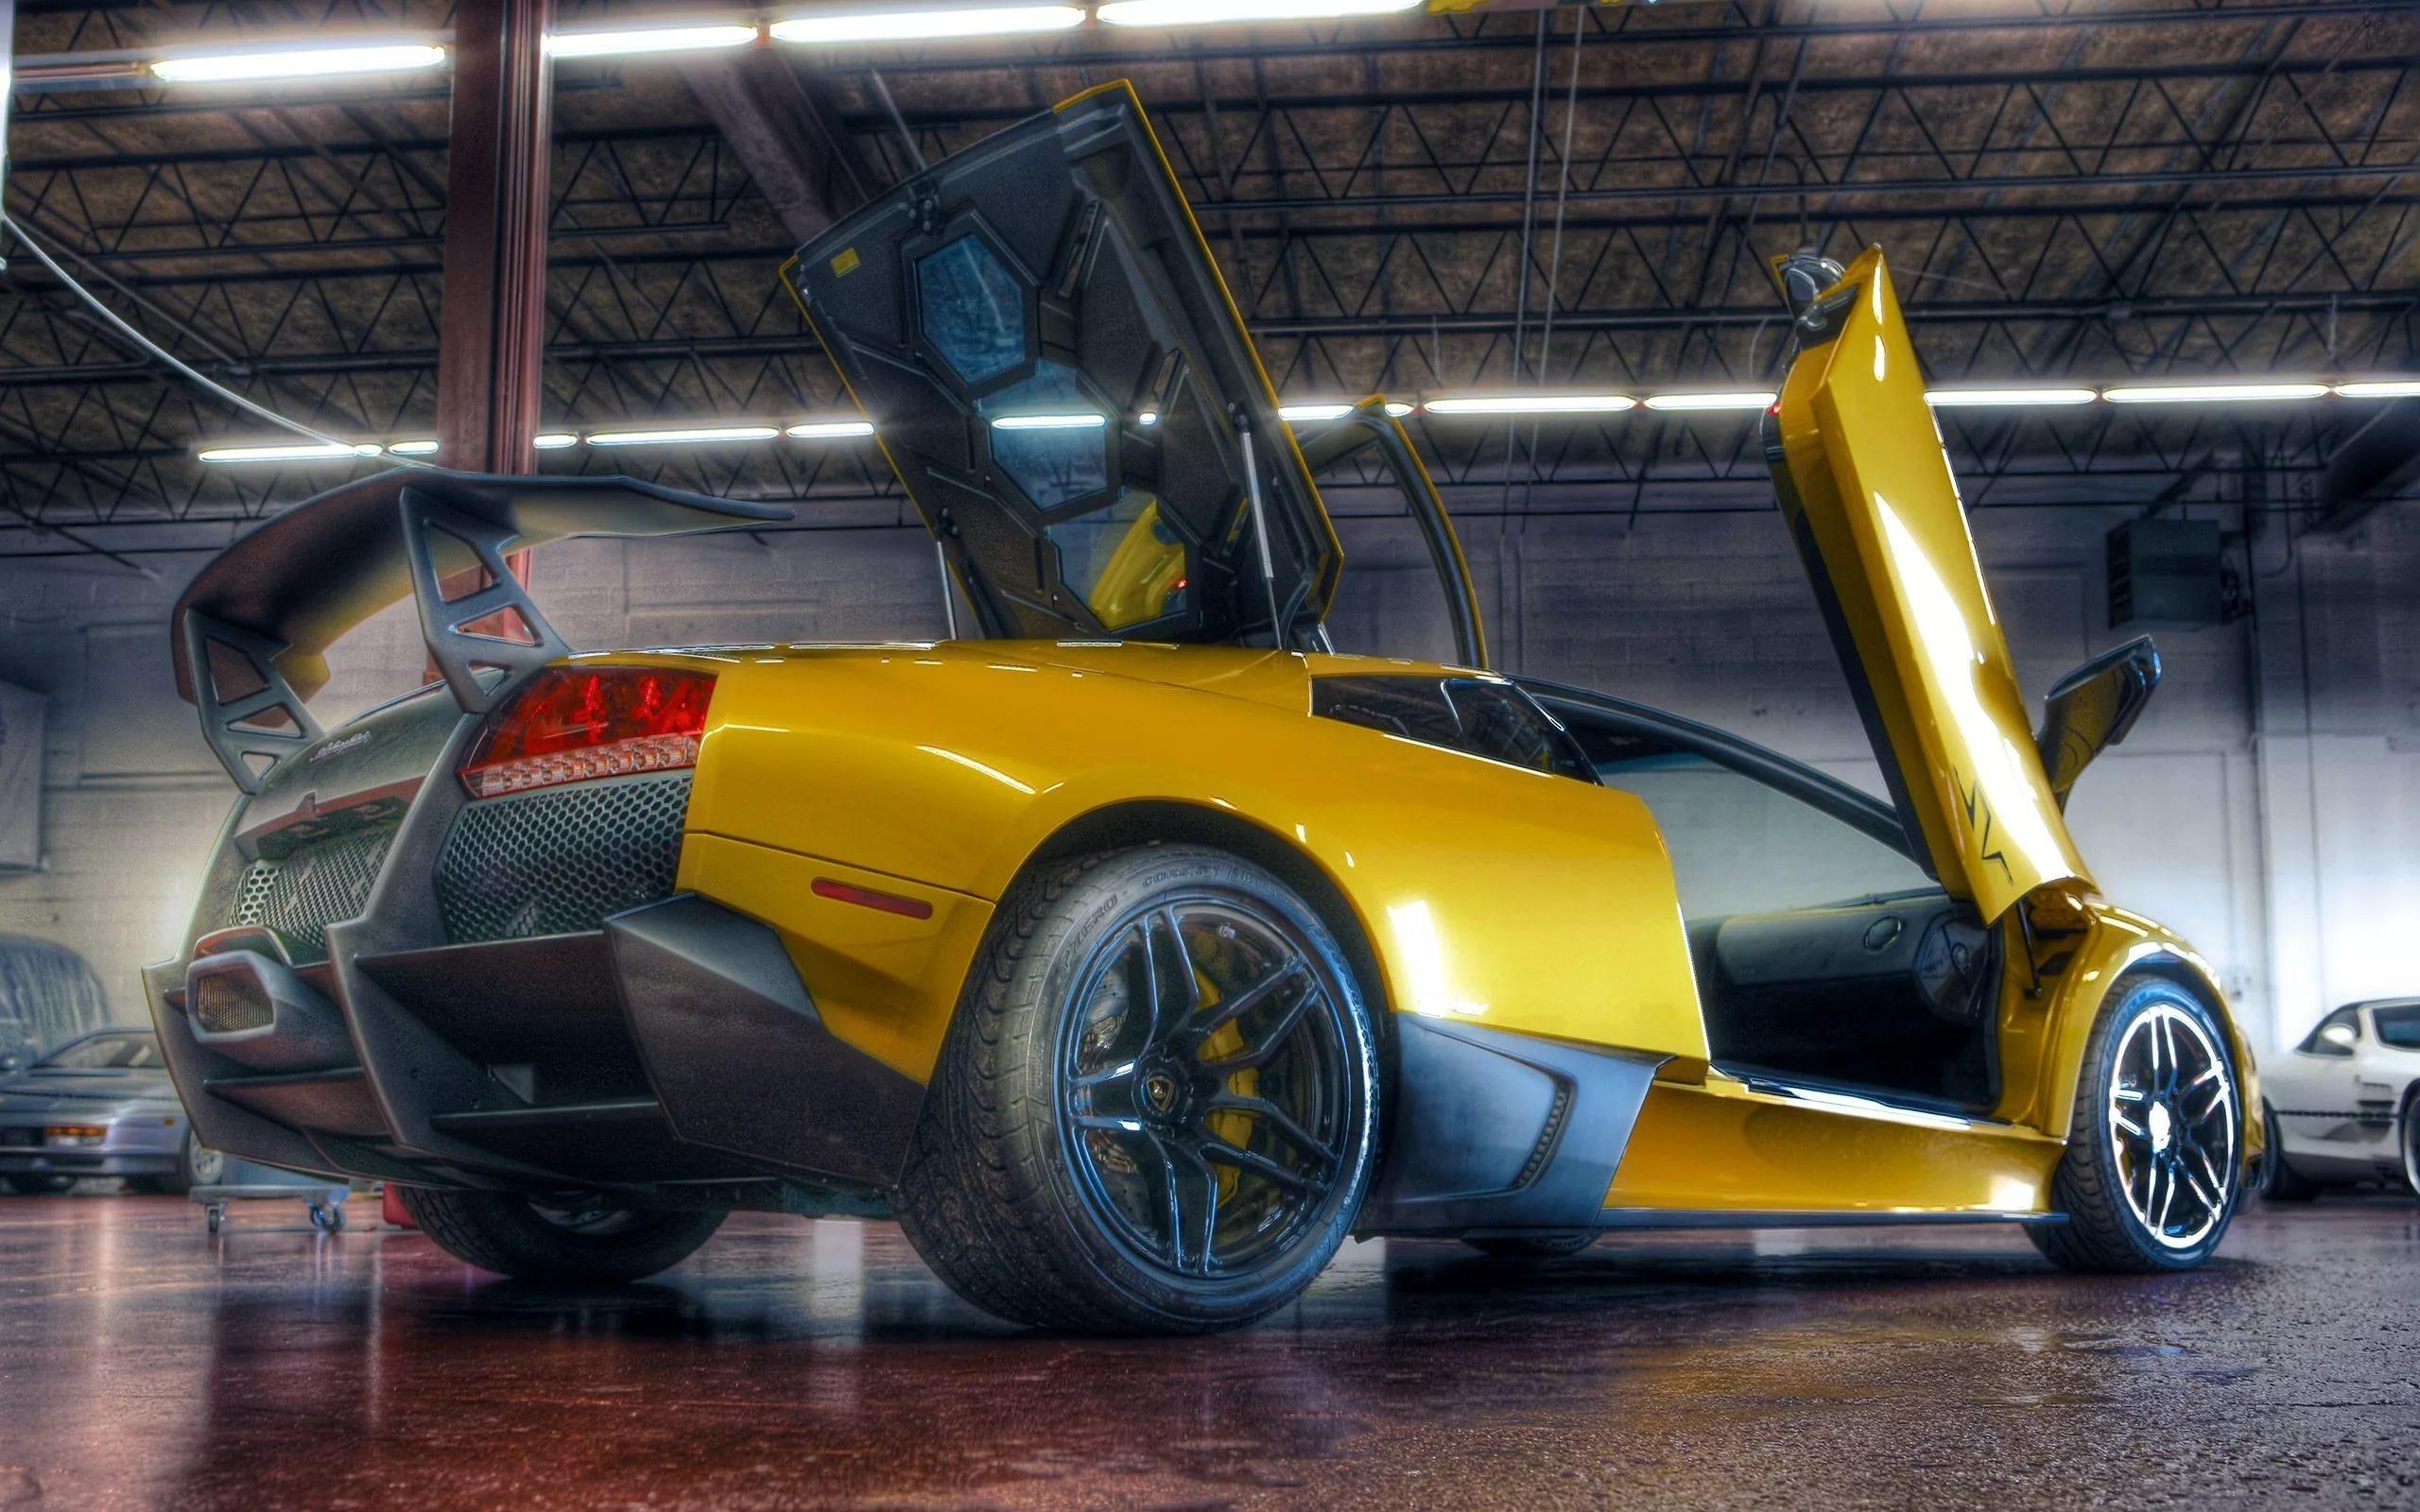 Картинка: Спорткар, Lamborghini Murcielago, LP670-4, SuperVeloce, жёлтый, гараж